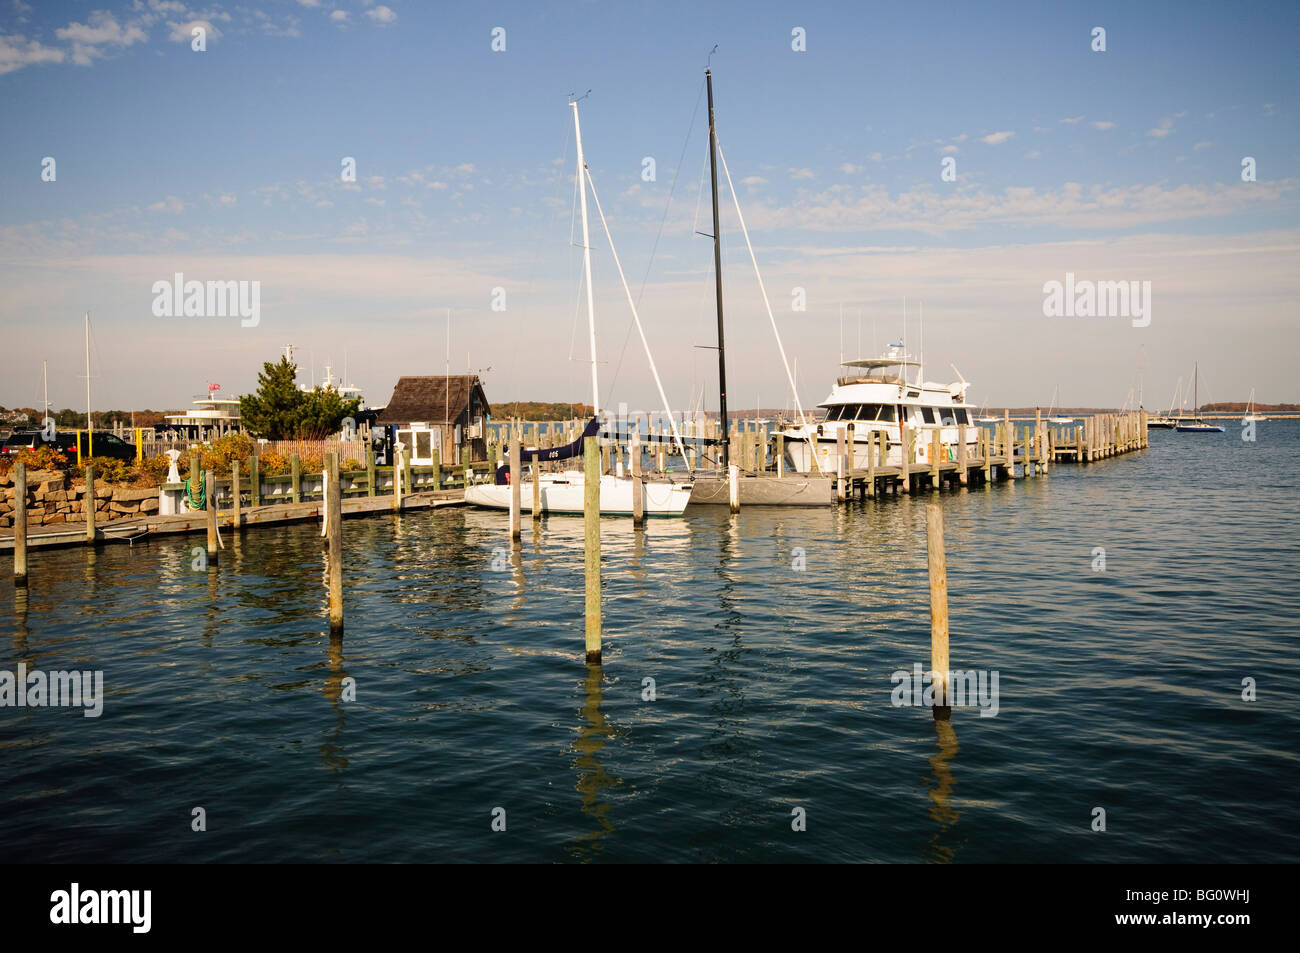 Sag Harbor, The Hamptons, Long Island, New York State, United States of America, North America - Stock Image